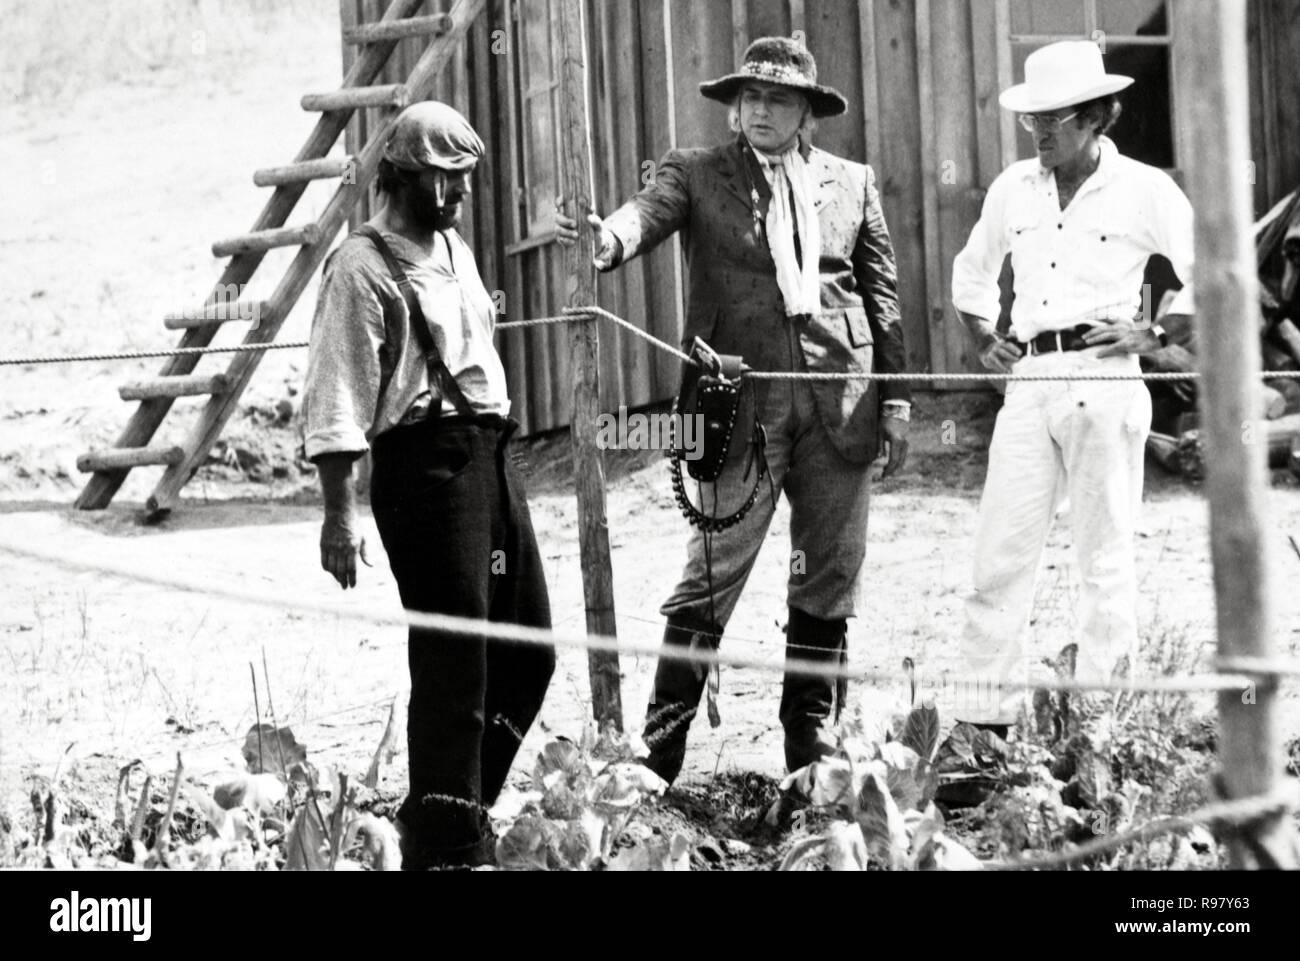 Original film title: THE MISSOURI BREAKS. English title: THE MISSOURI BREAKS. Year: 1976. Director: ARTHUR PENN. Stars: ARTHUR PENN; JACK NICHOLSON; MARLON BRANDO. Credit: UNITED ARTISTS / Album - Stock Image